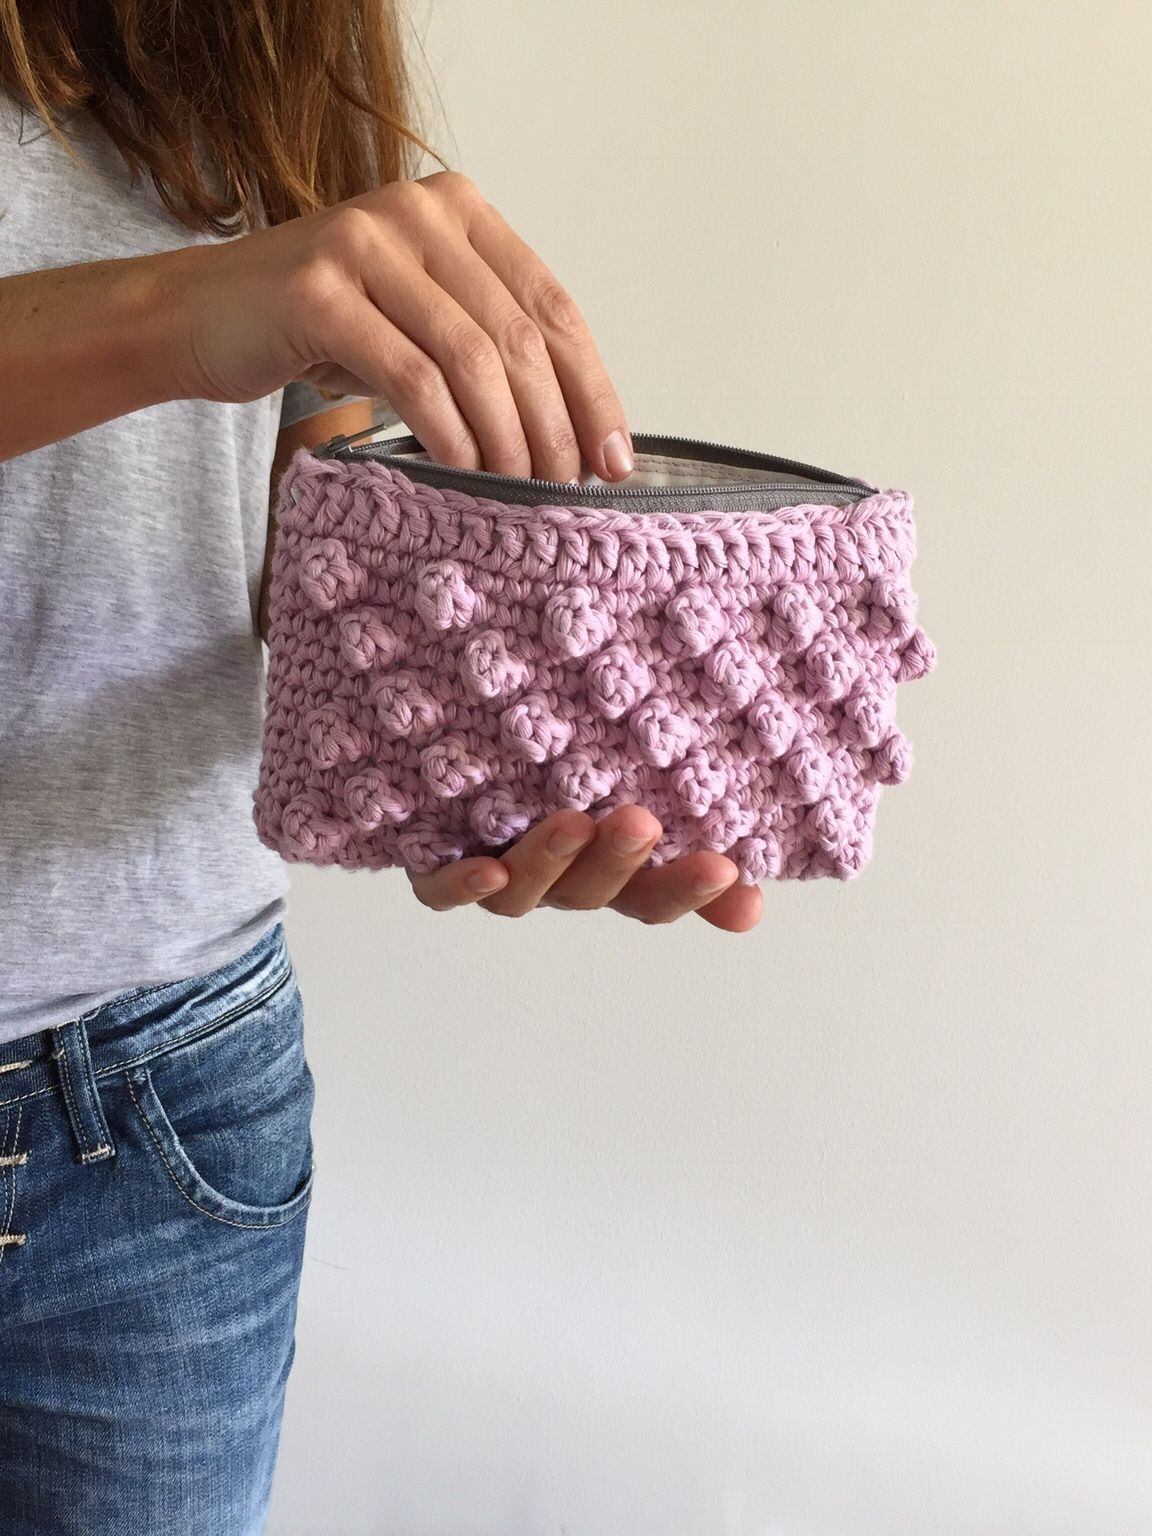 Linhas de croche online dating